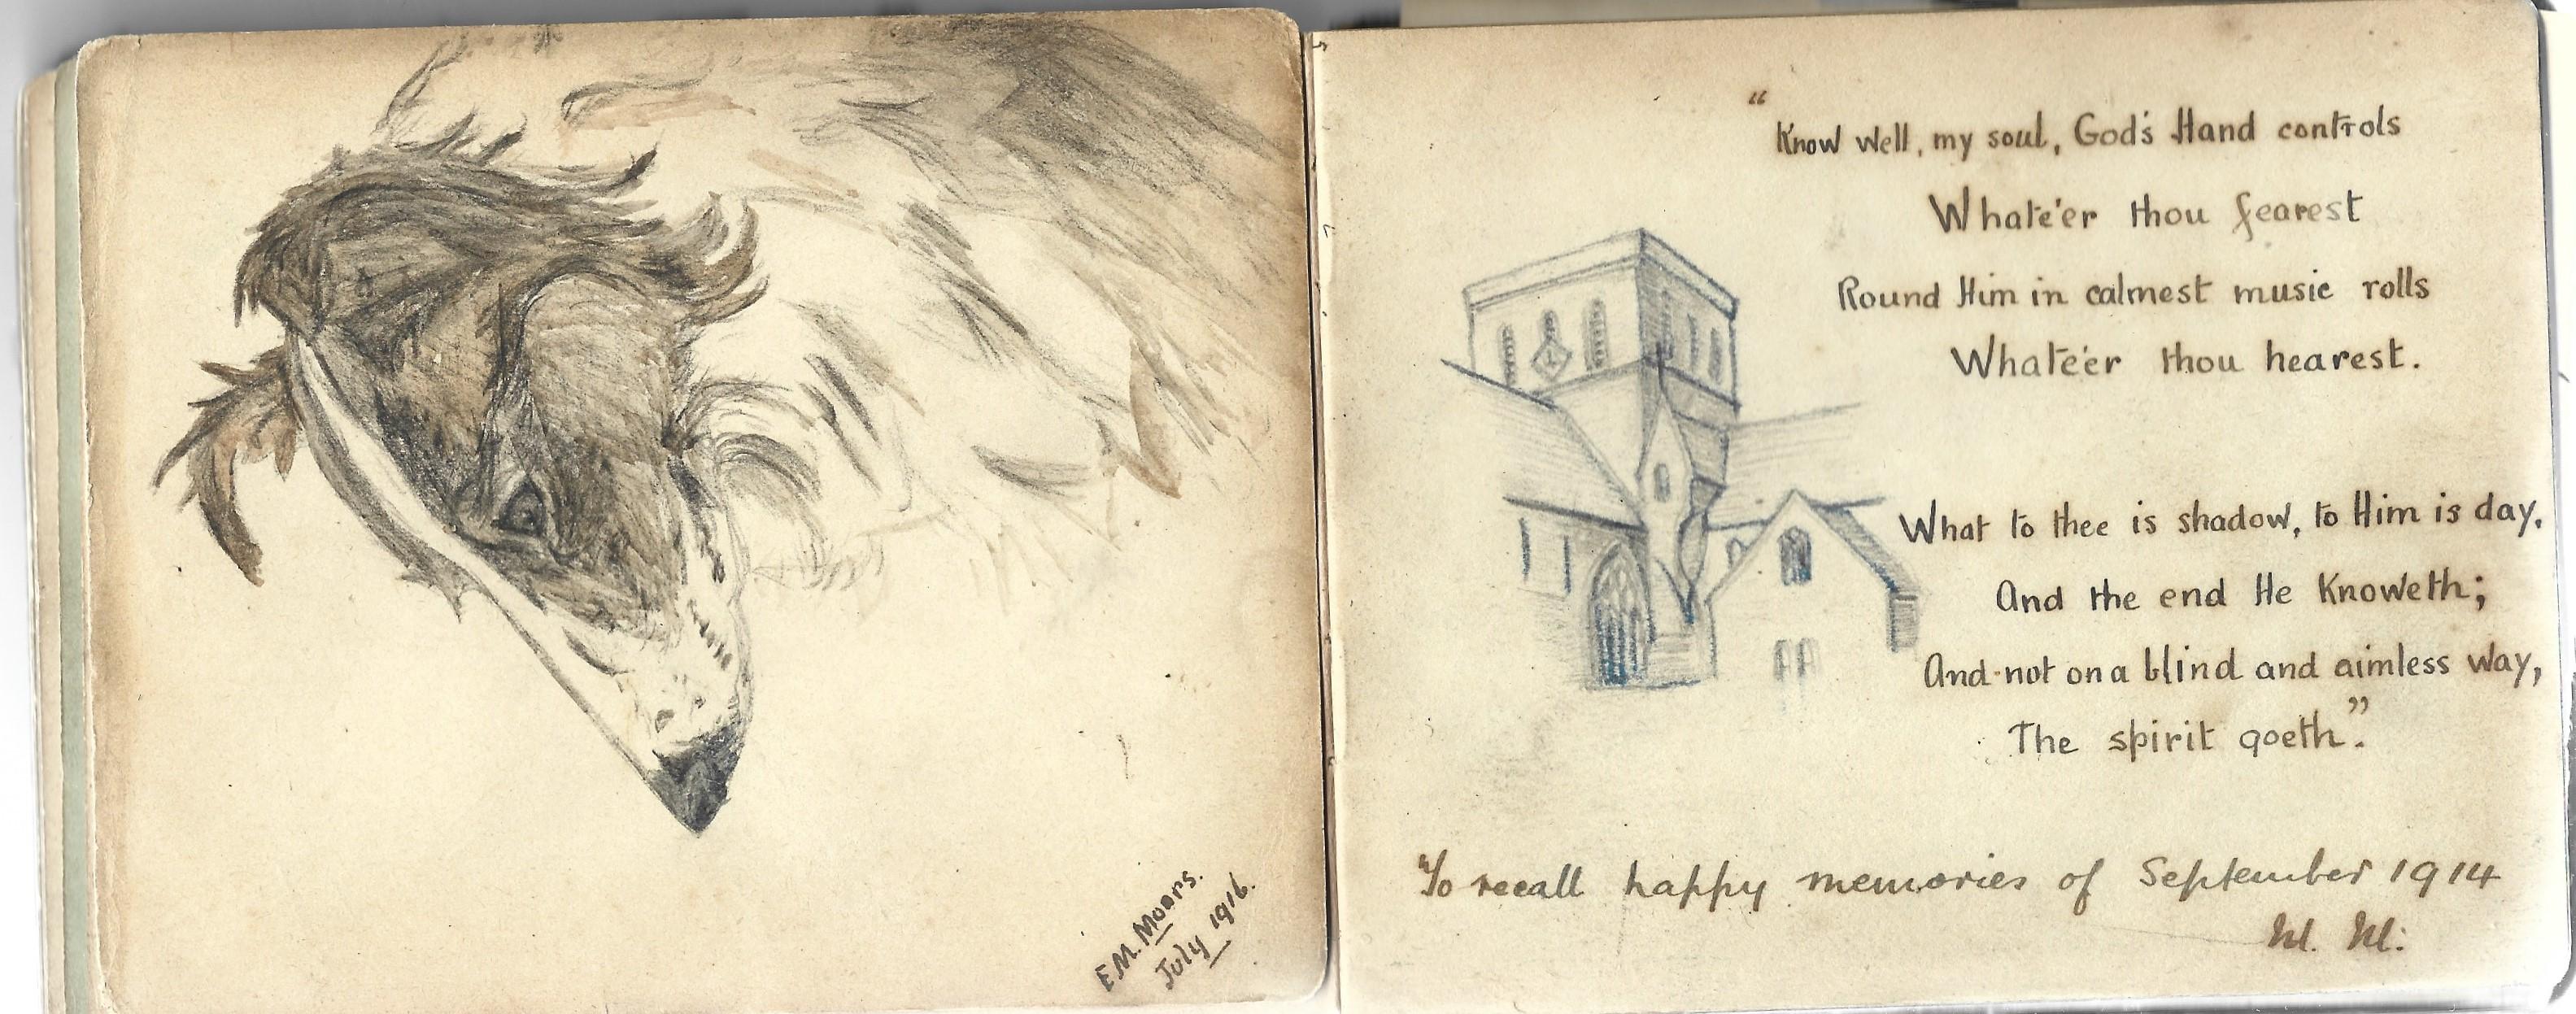 A World War 1 era autograph album, mostly comprising poignant poems and verses, a few original - Image 7 of 8